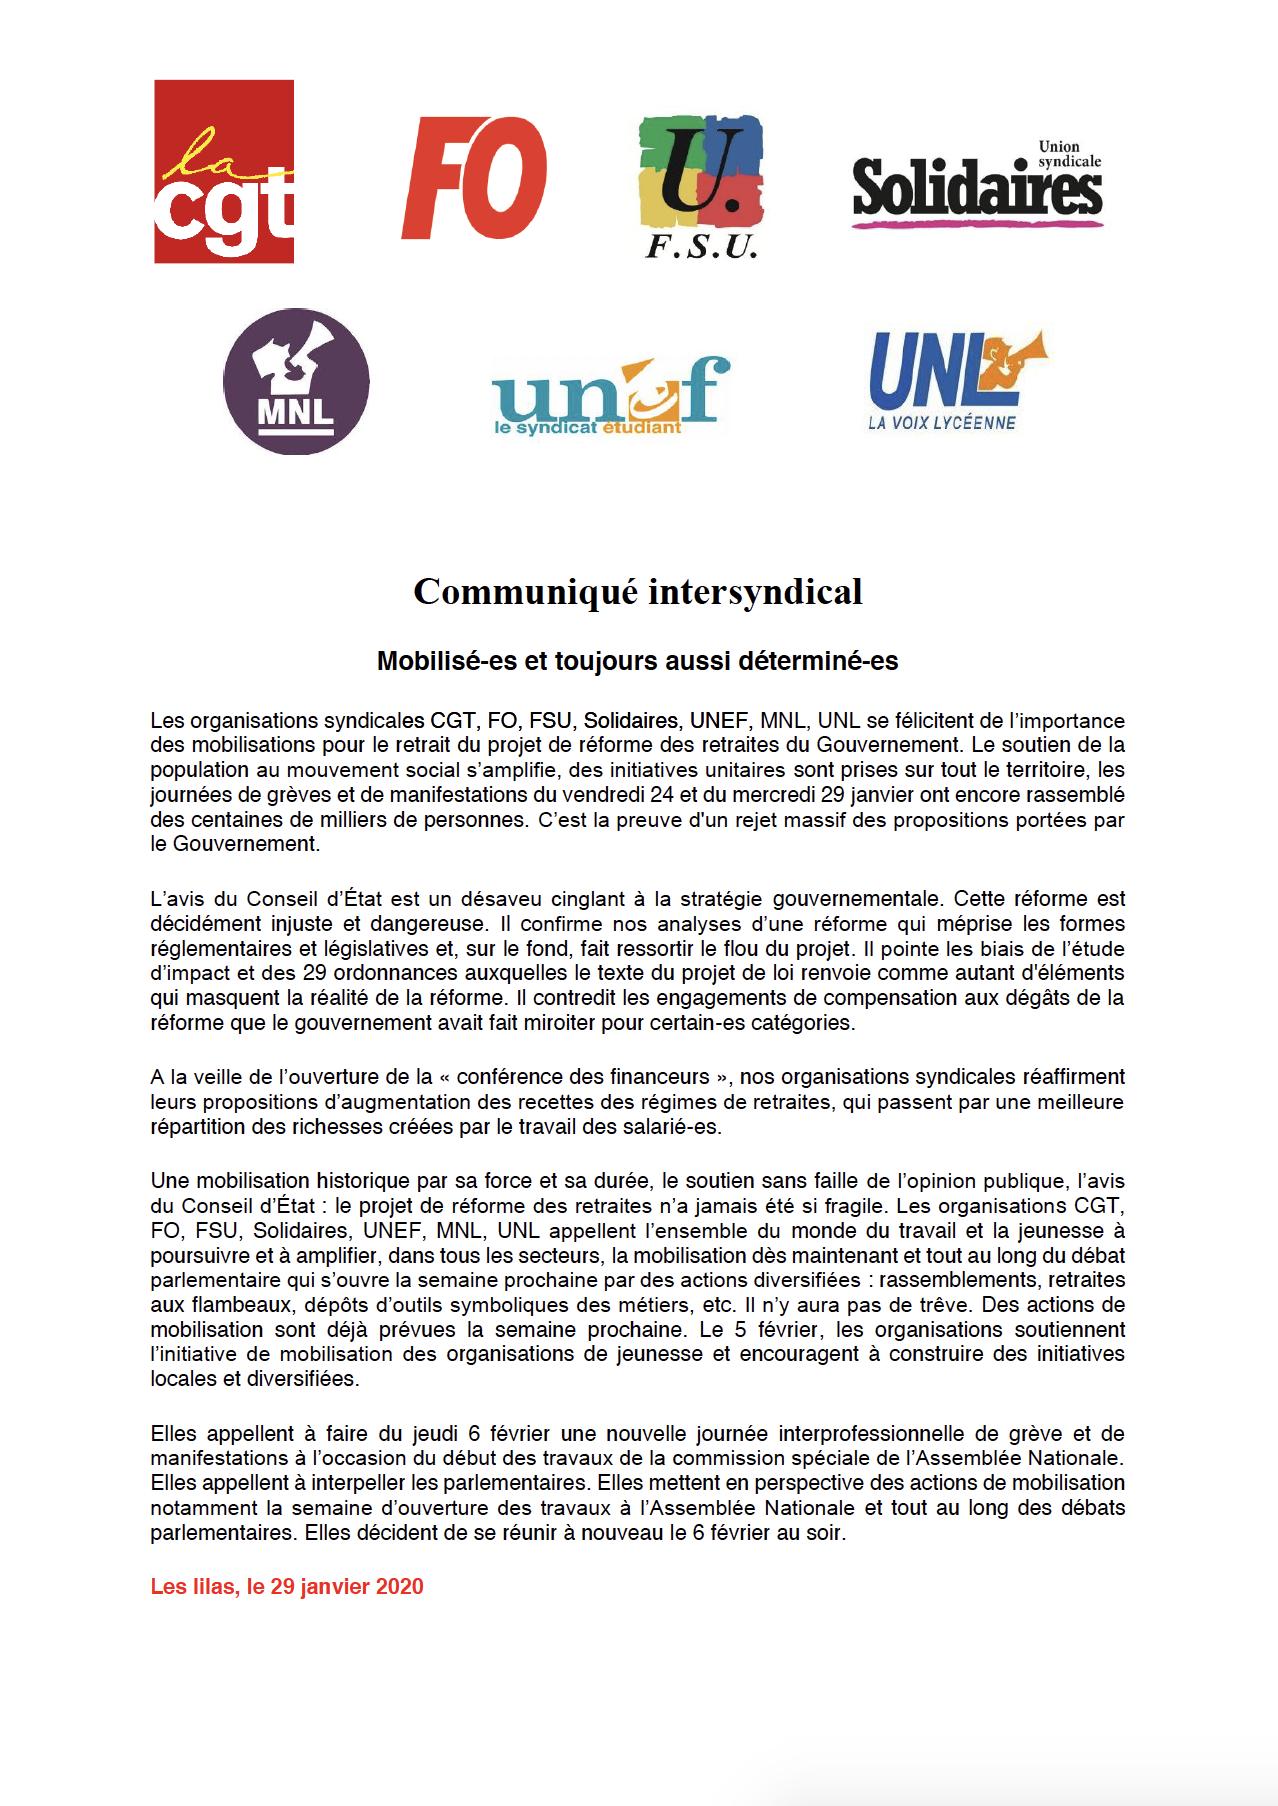 Communiqué Intersyndical